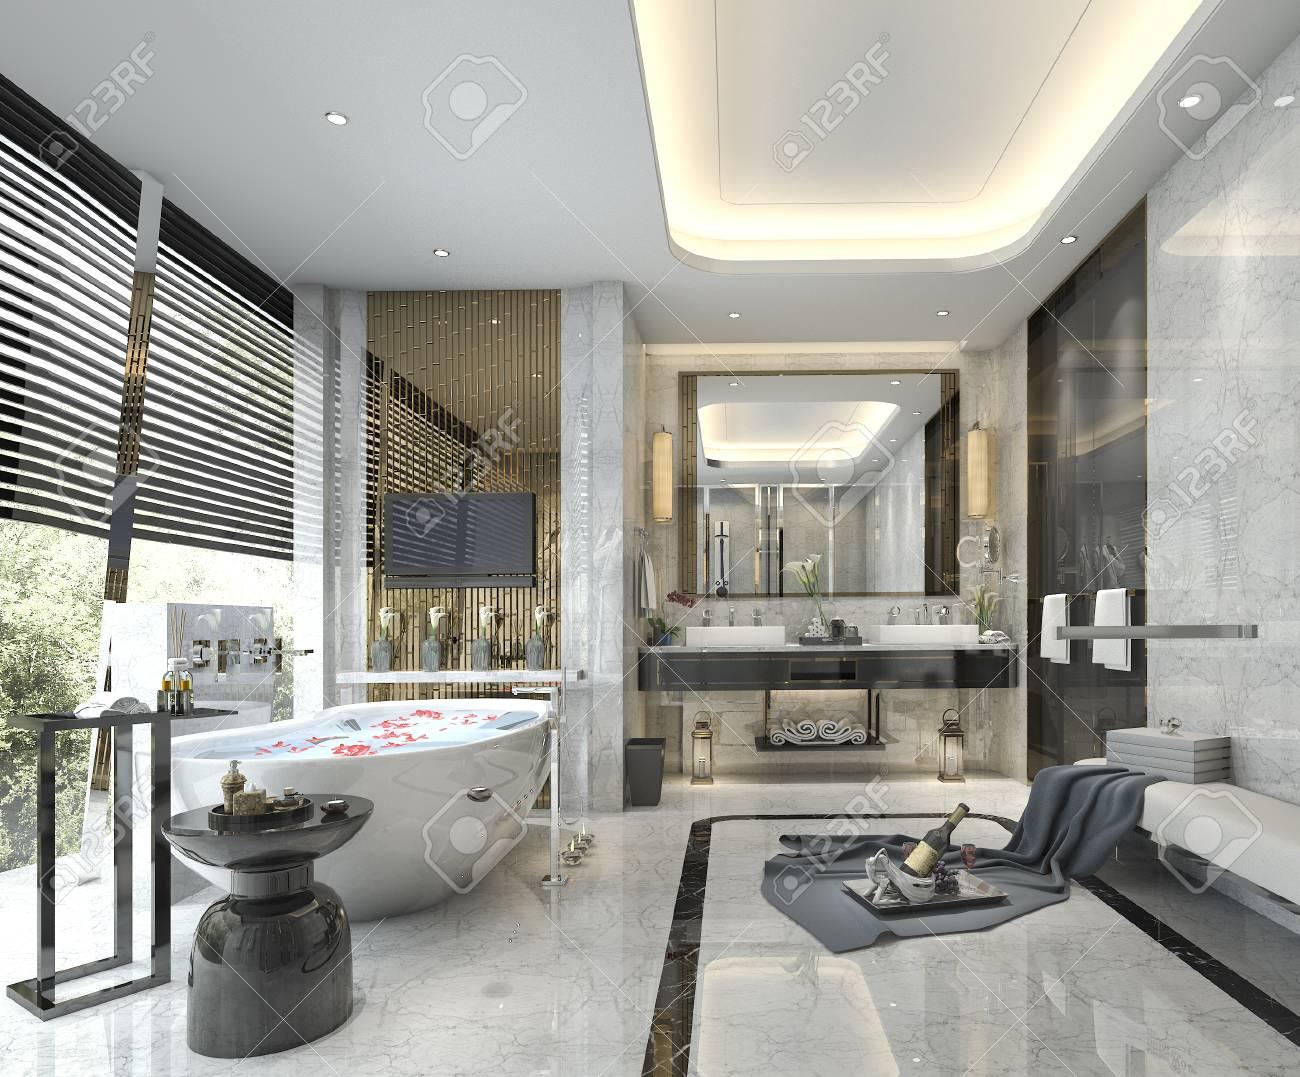 Conforama Salle De Bain Meuble ~ Salle De Bains Classique Moderne Offrant Un D Cor De Carrelage De